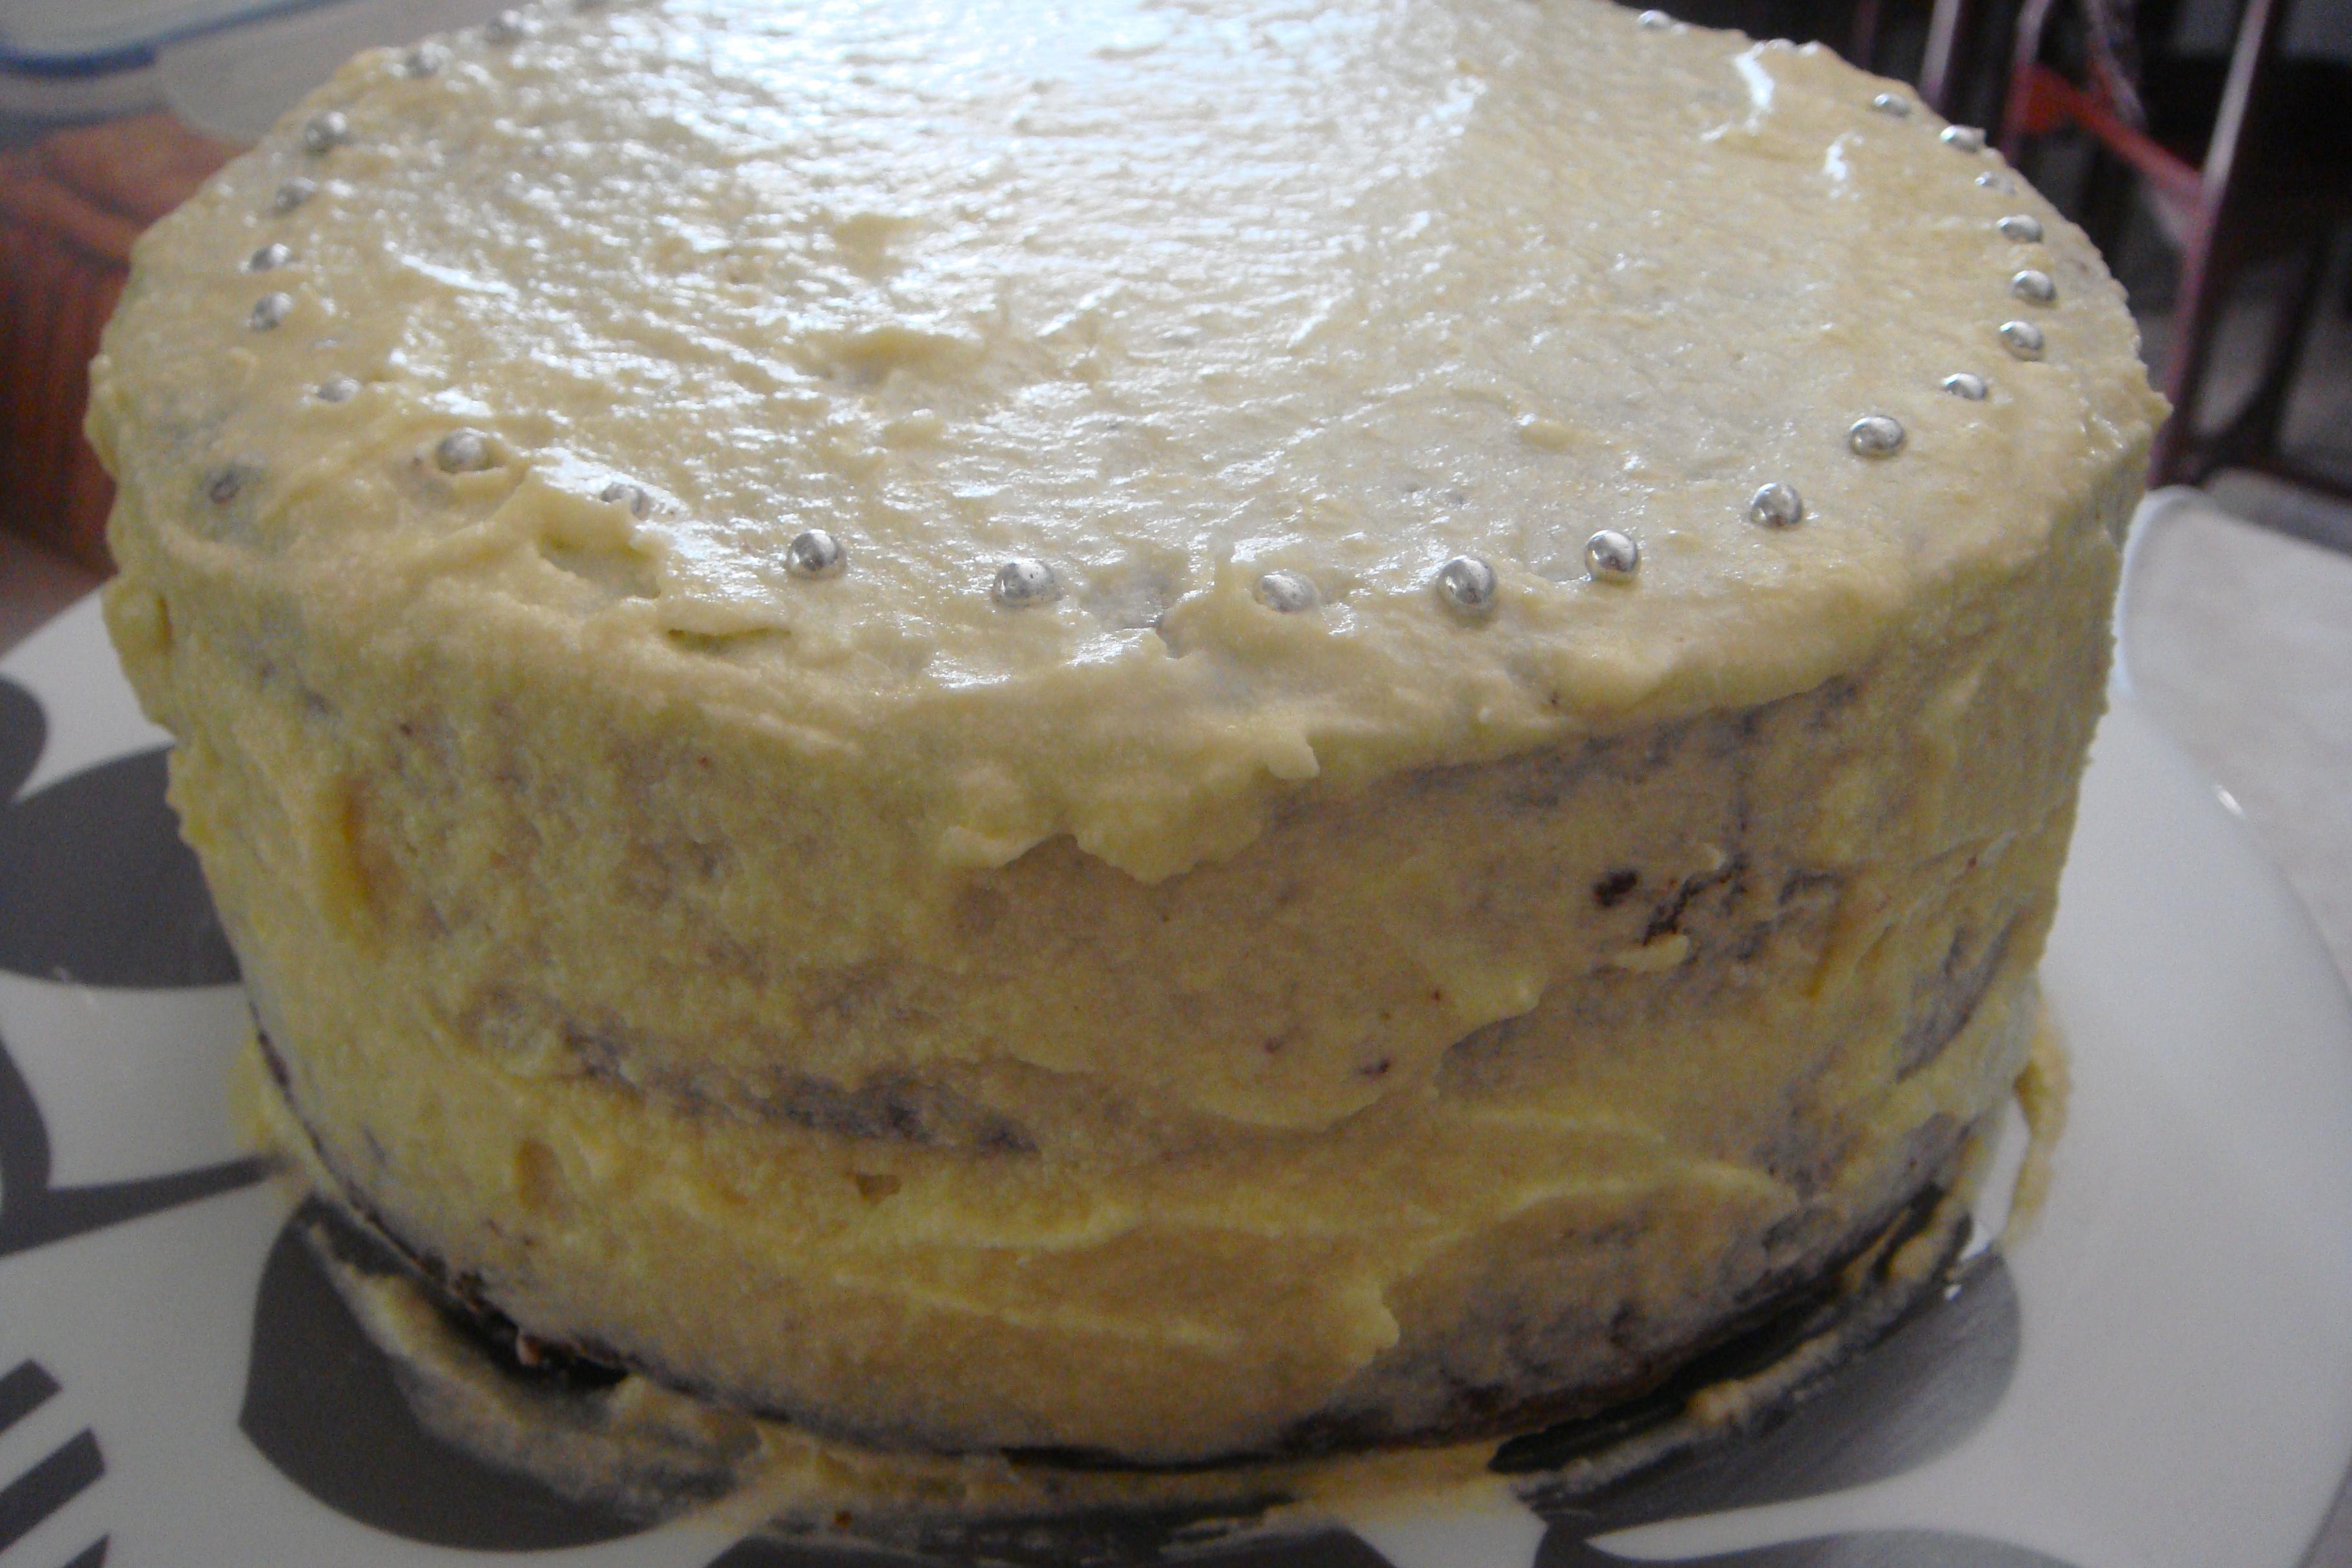 Vegan Chocolate Avocado Cake with Non-Vegan Condensed Milk ...